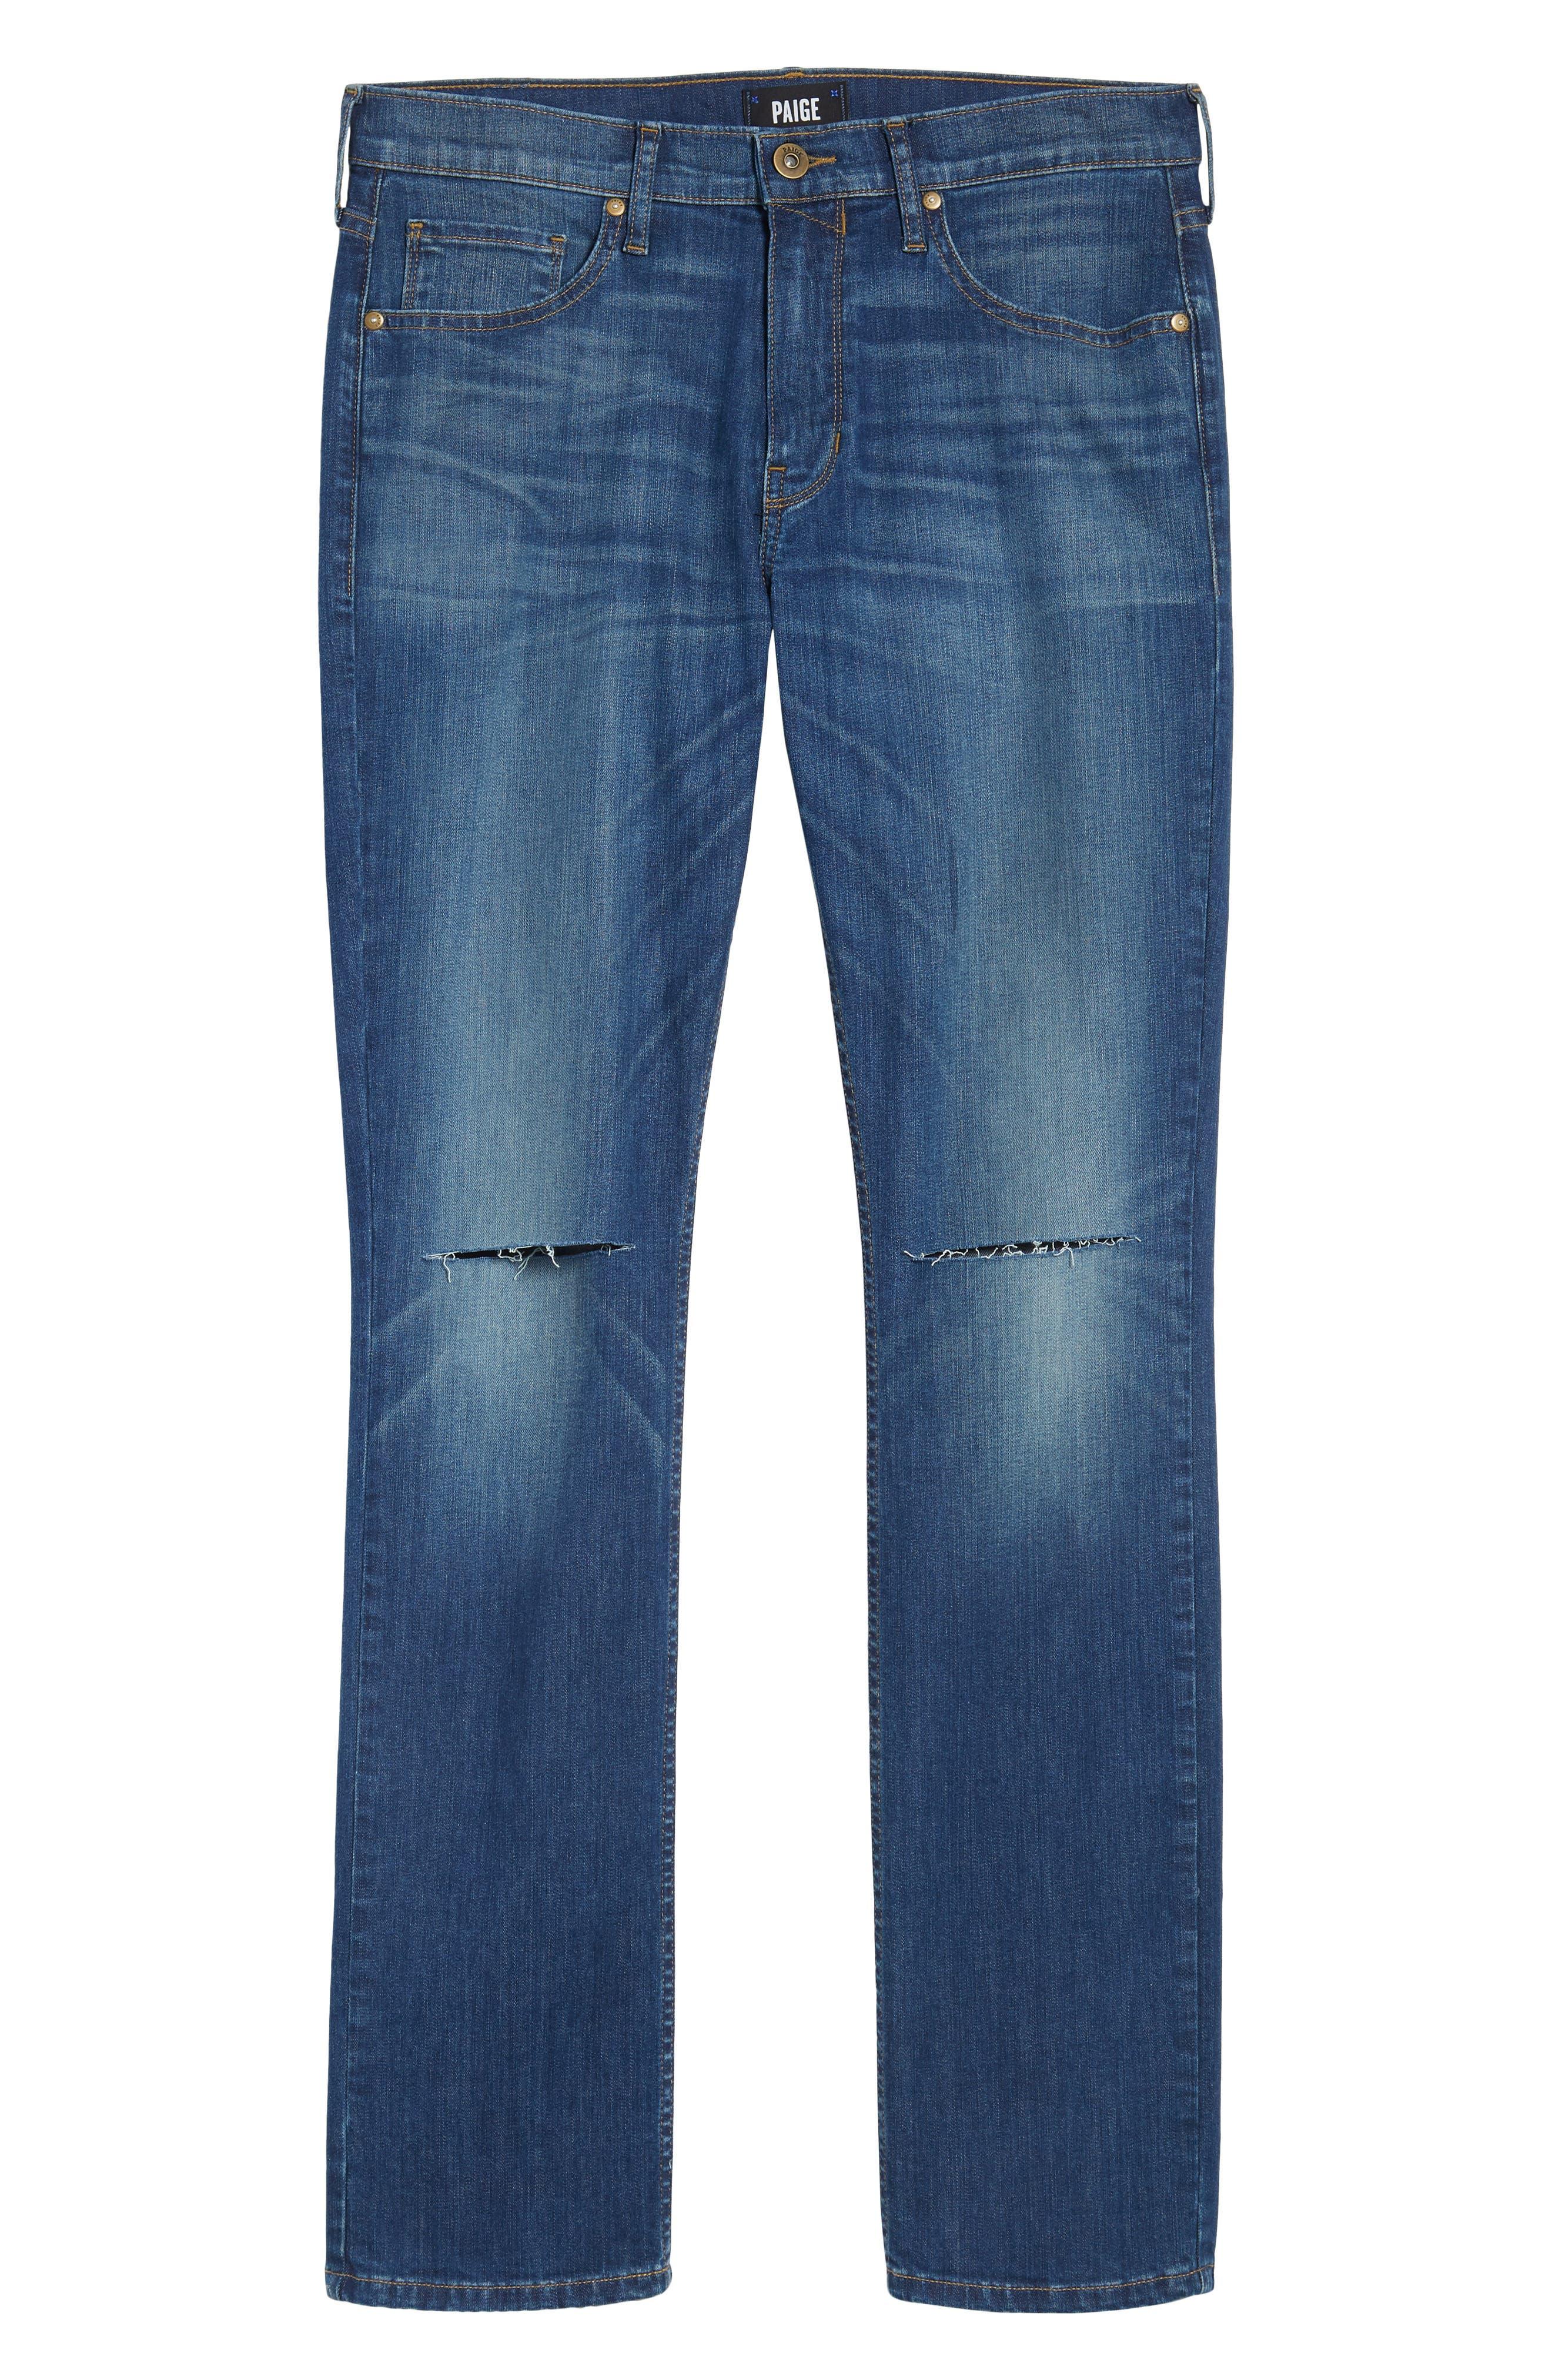 Lennox Slim Fit Jeans,                             Alternate thumbnail 6, color,                             Harlan Destructed